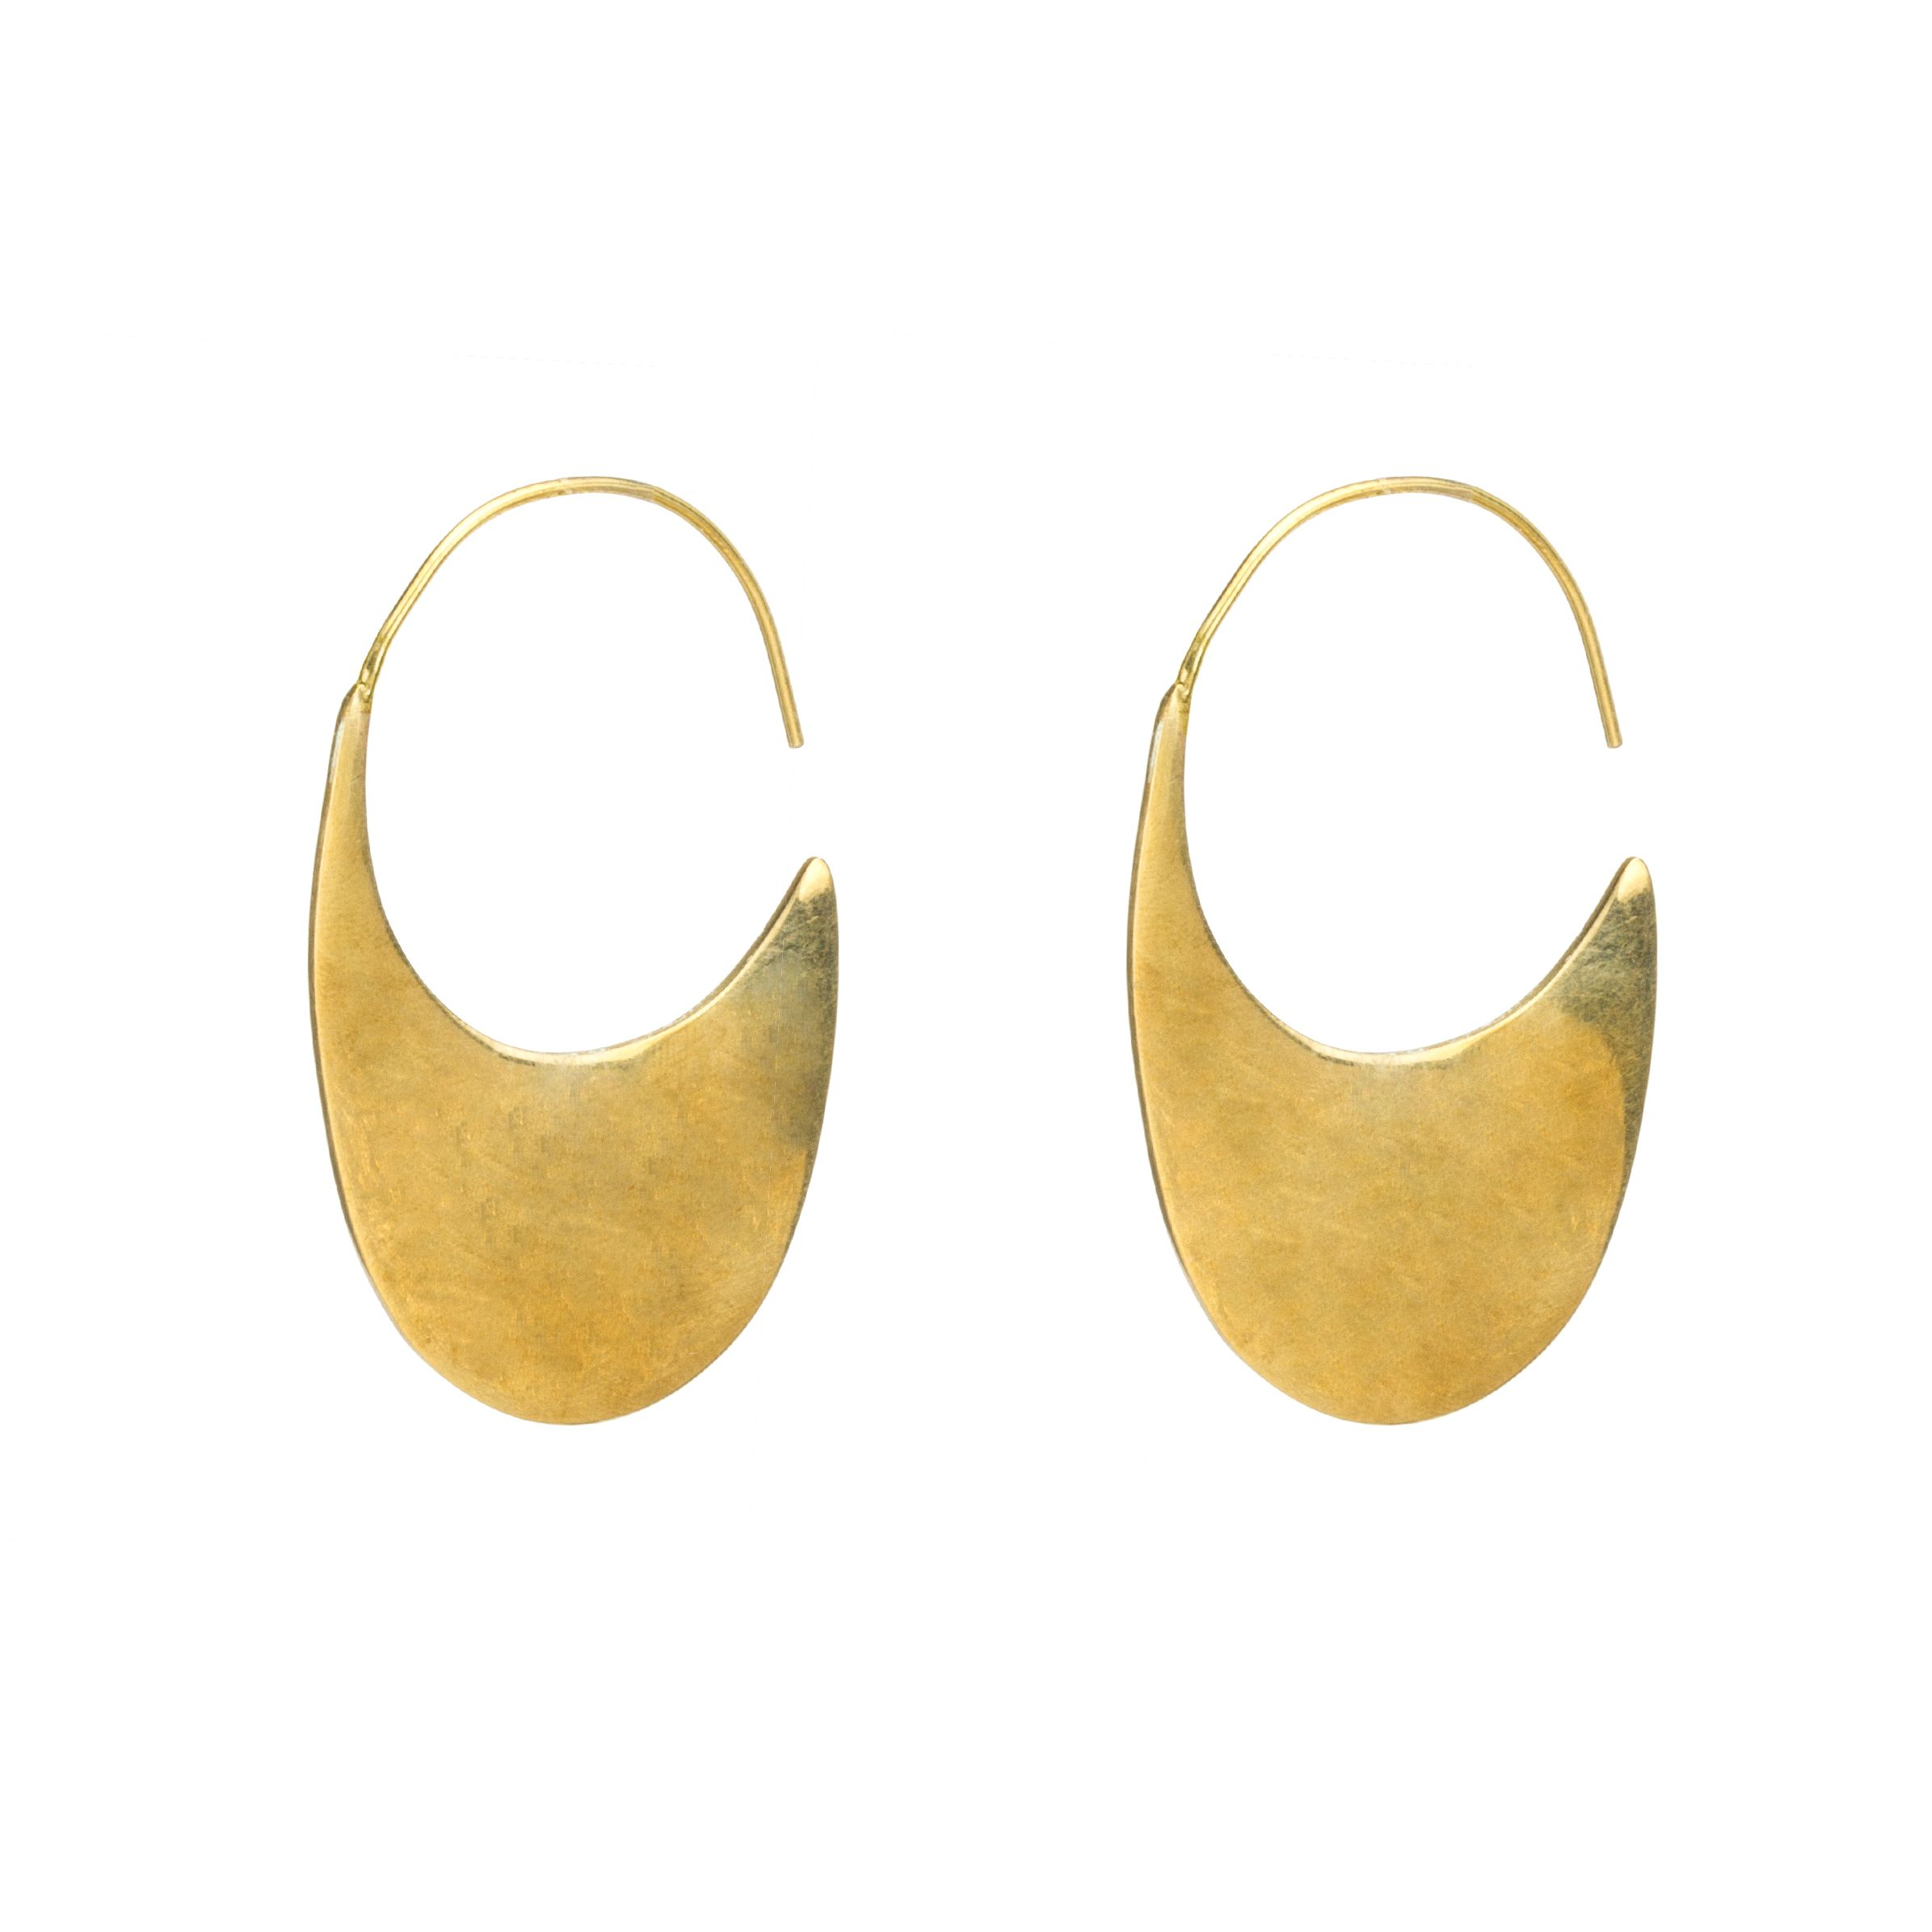 Product Image for Mezi Drama Threader Earrings